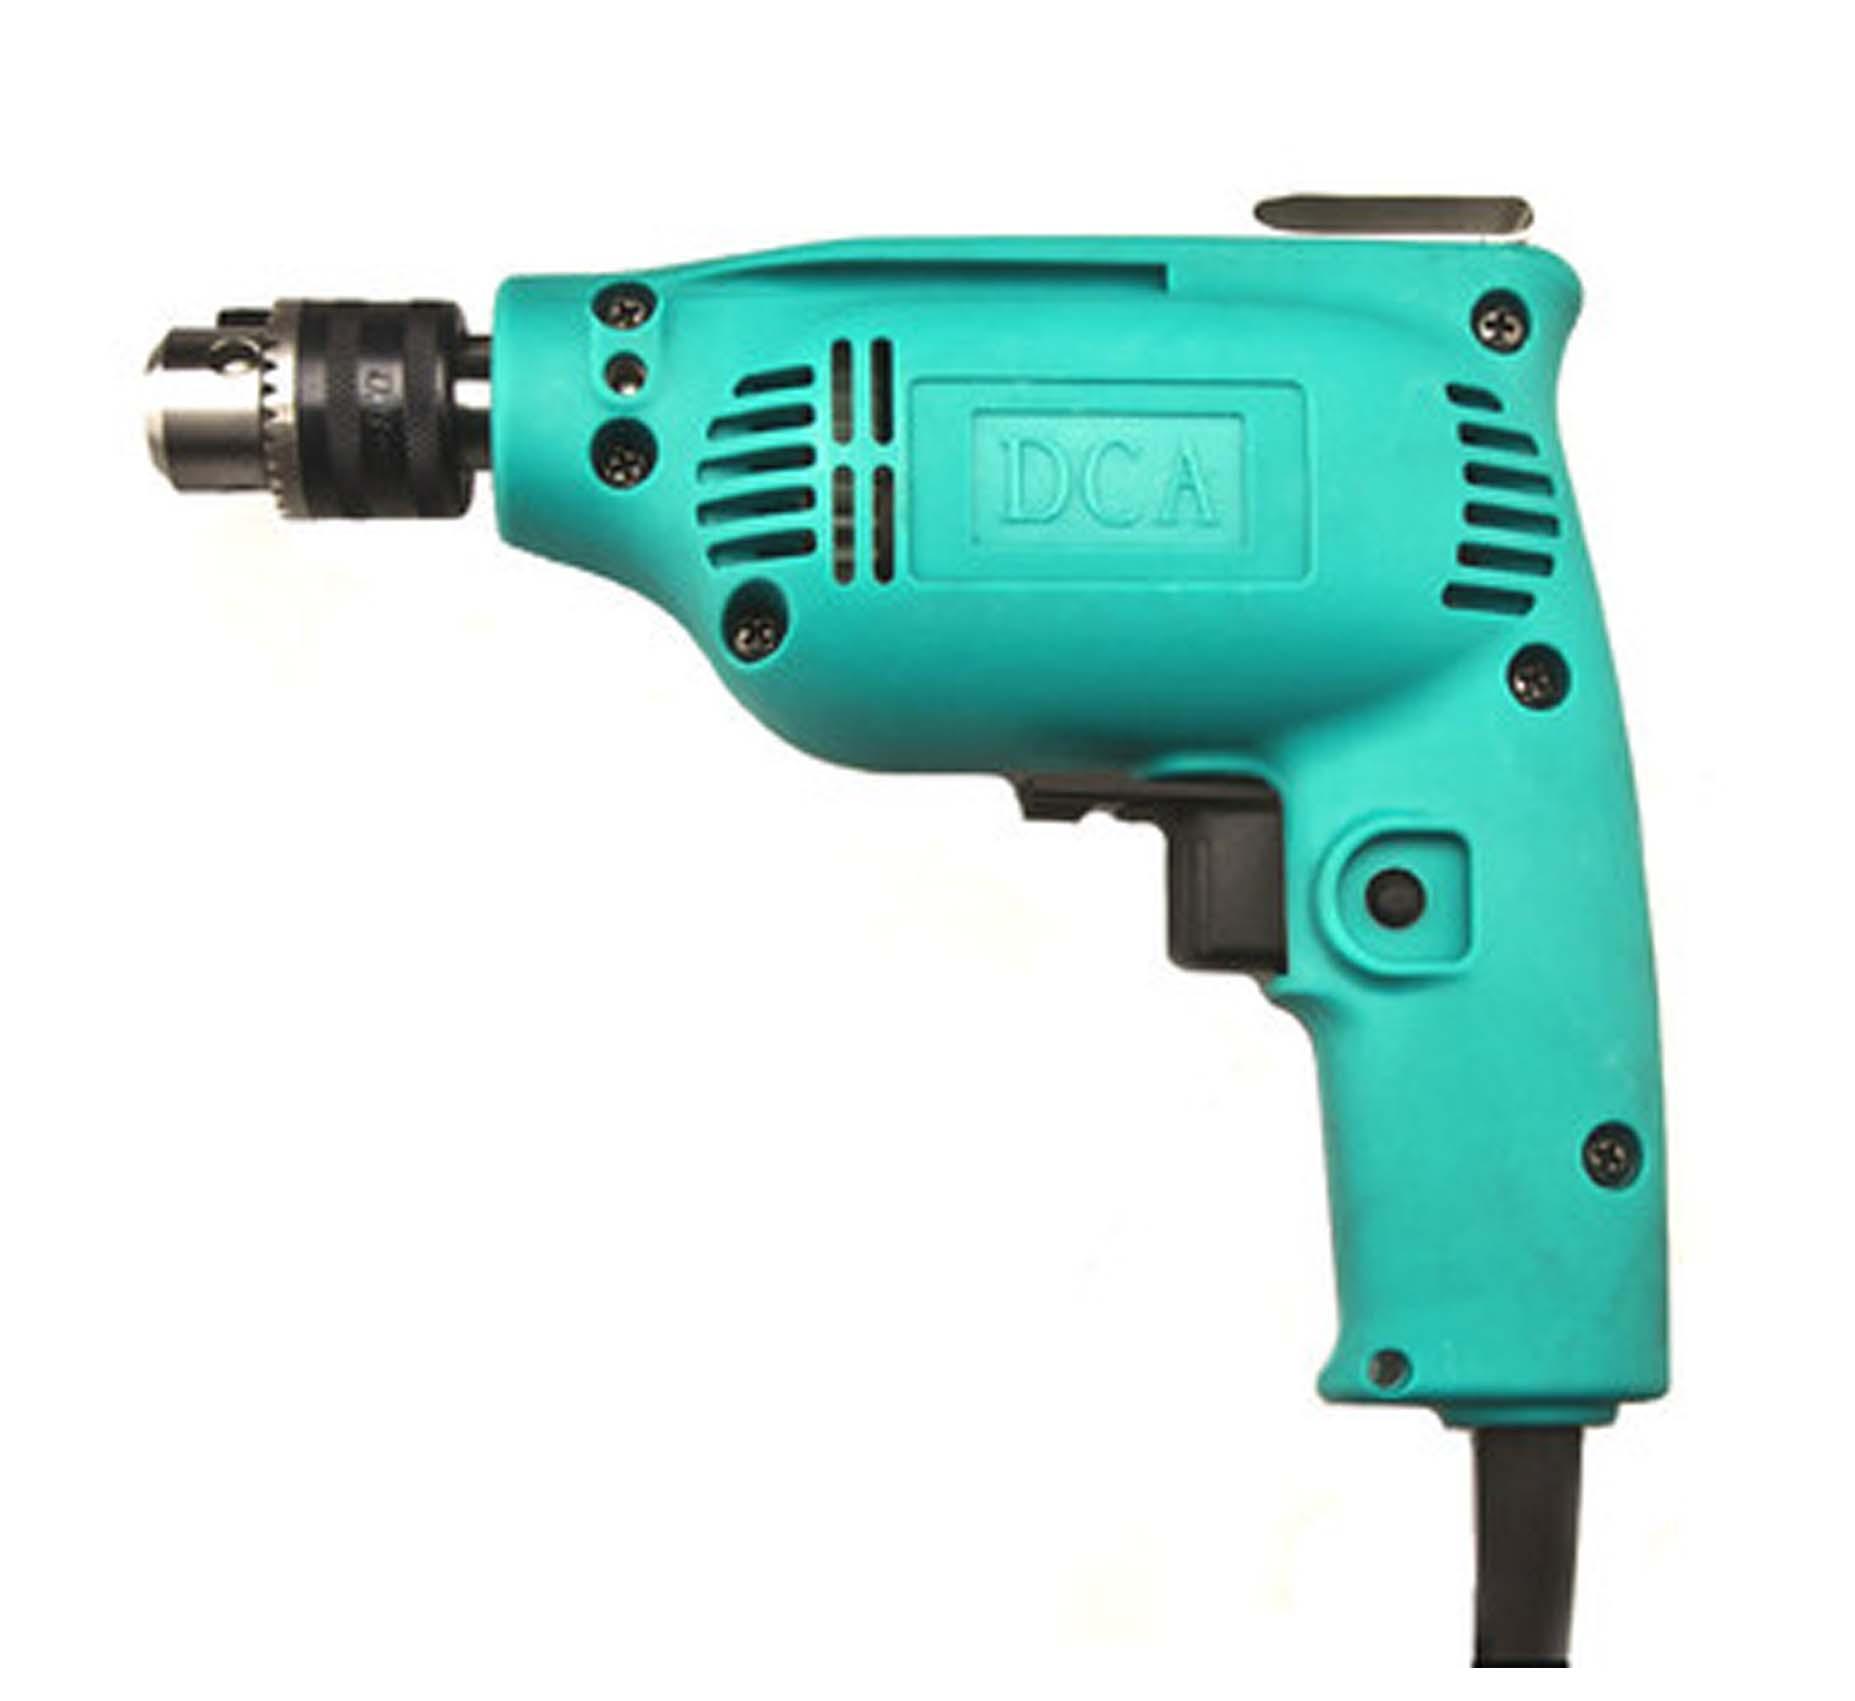 Harga Bosch Gbm 13 Re Mesin Bor Besi Alumunium Kayu Hand Pipe Bender Krisbow 3 8 7 8in Kw1500520 Dca Ajz 02 6a 6mm